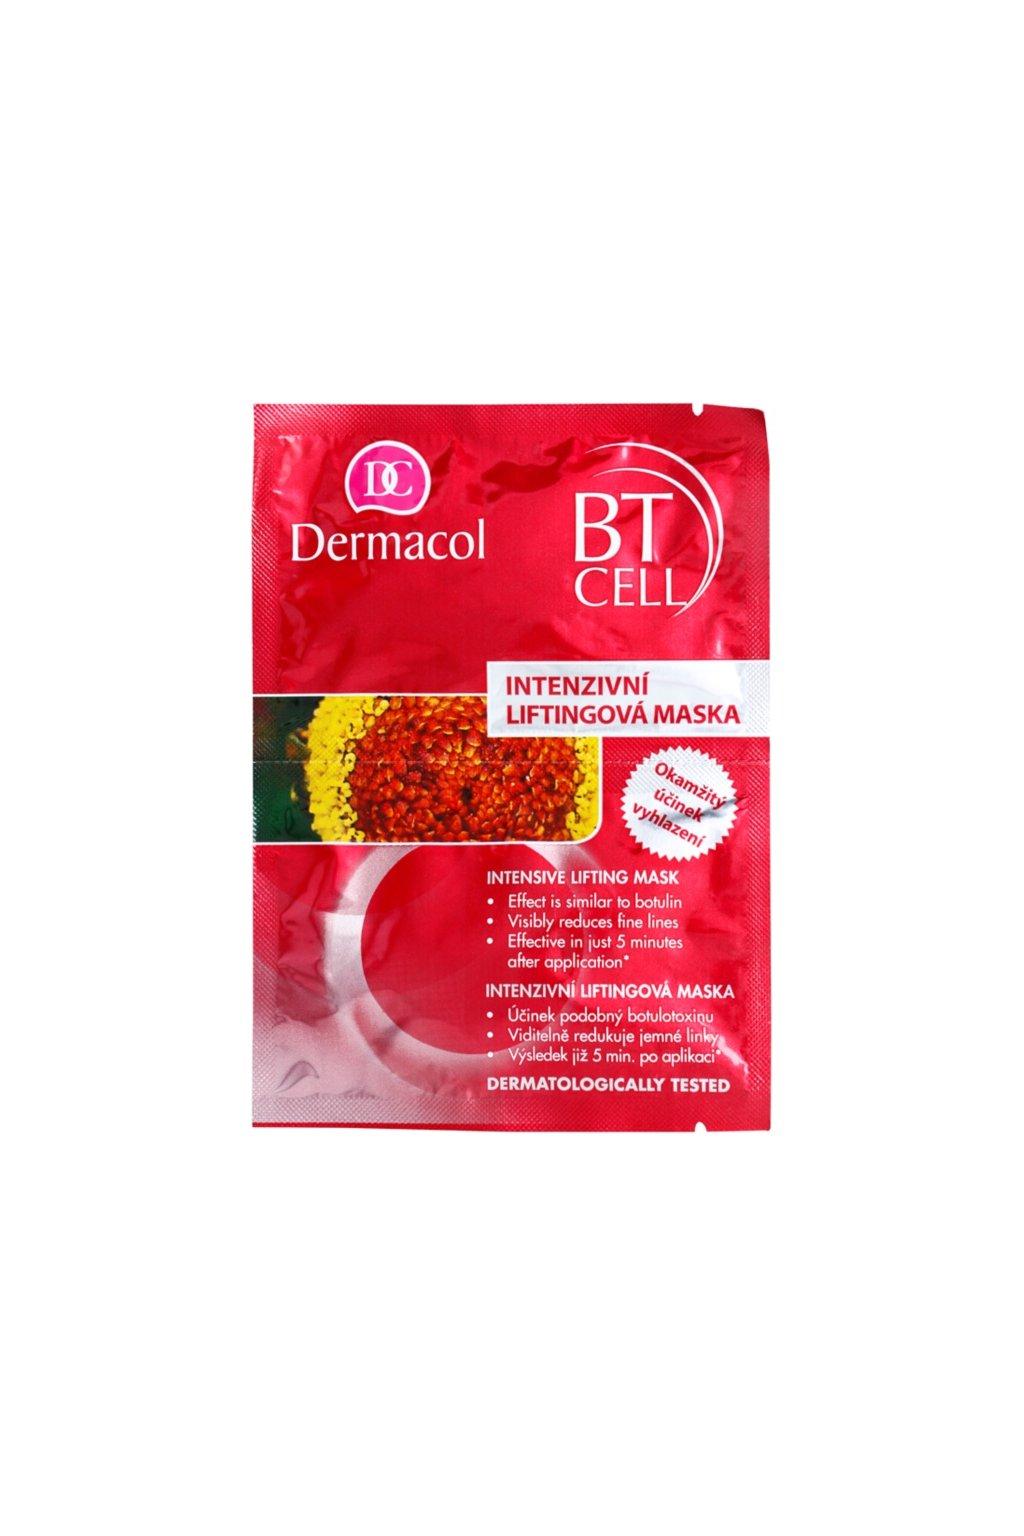 dermacol bt cell intenzivni liftingova maska jednorazova 25